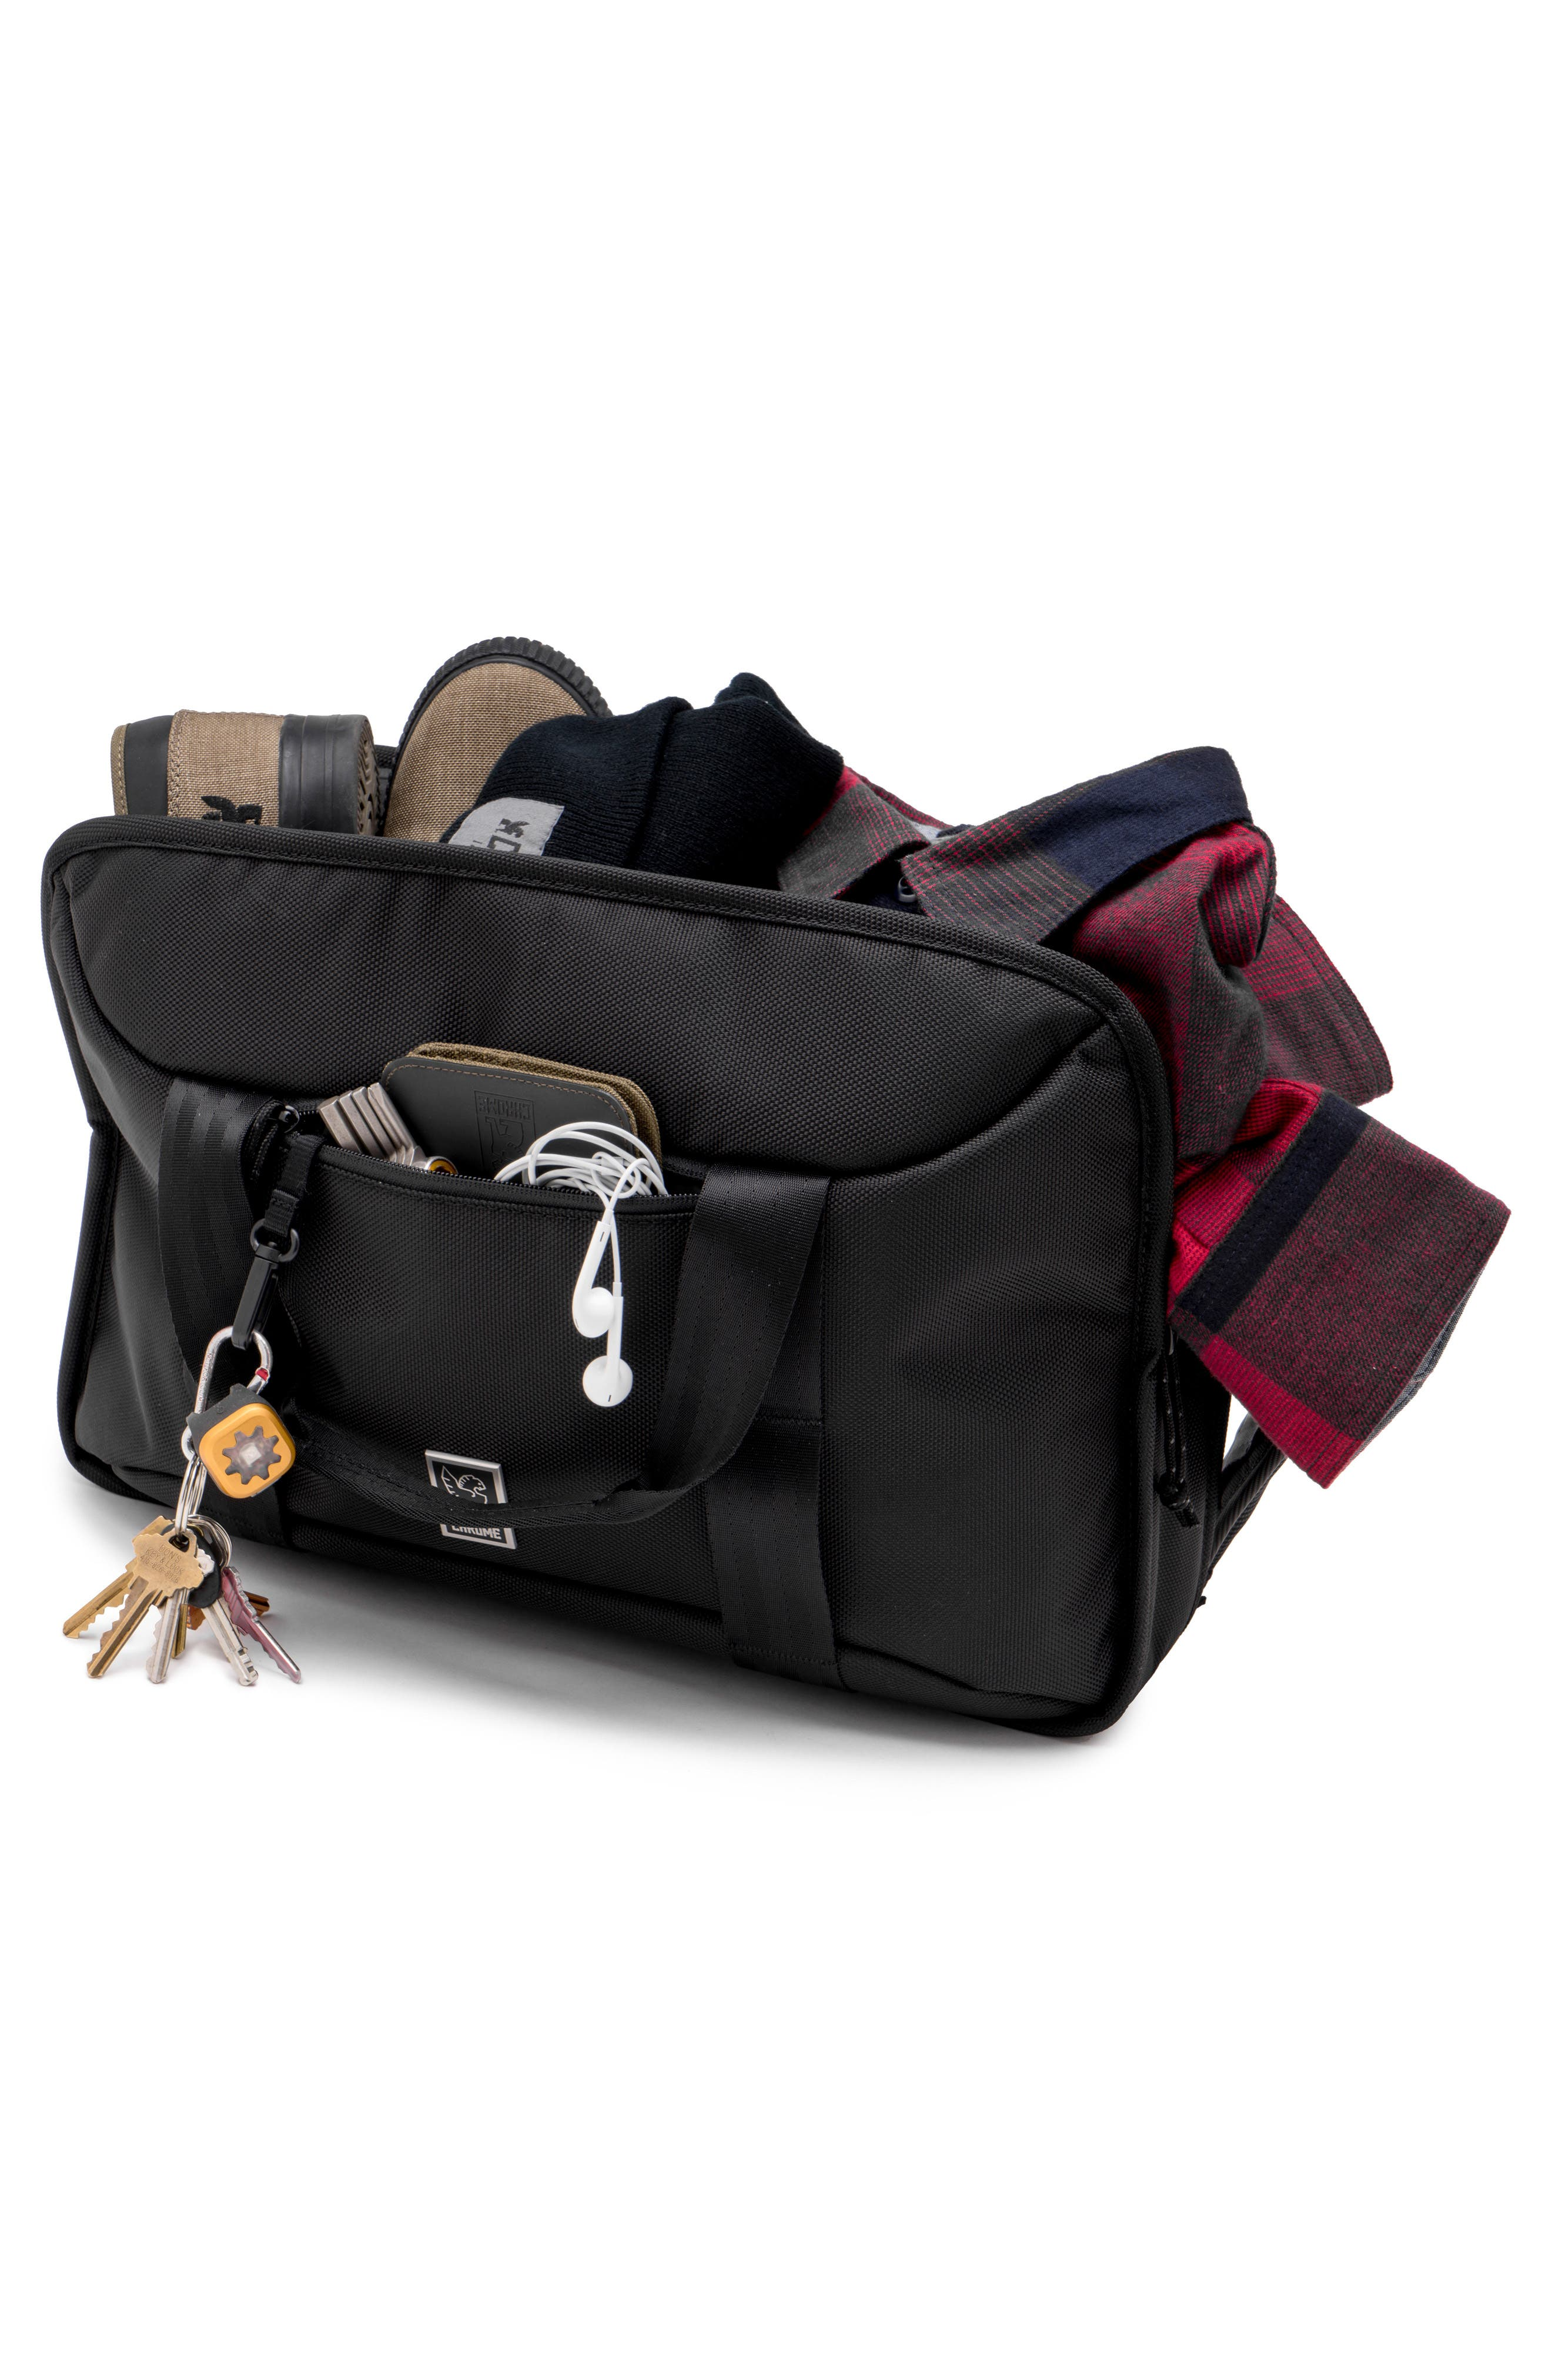 Treadwell Travel Vega Convertible Briefcase,                             Alternate thumbnail 4, color,                             All Black